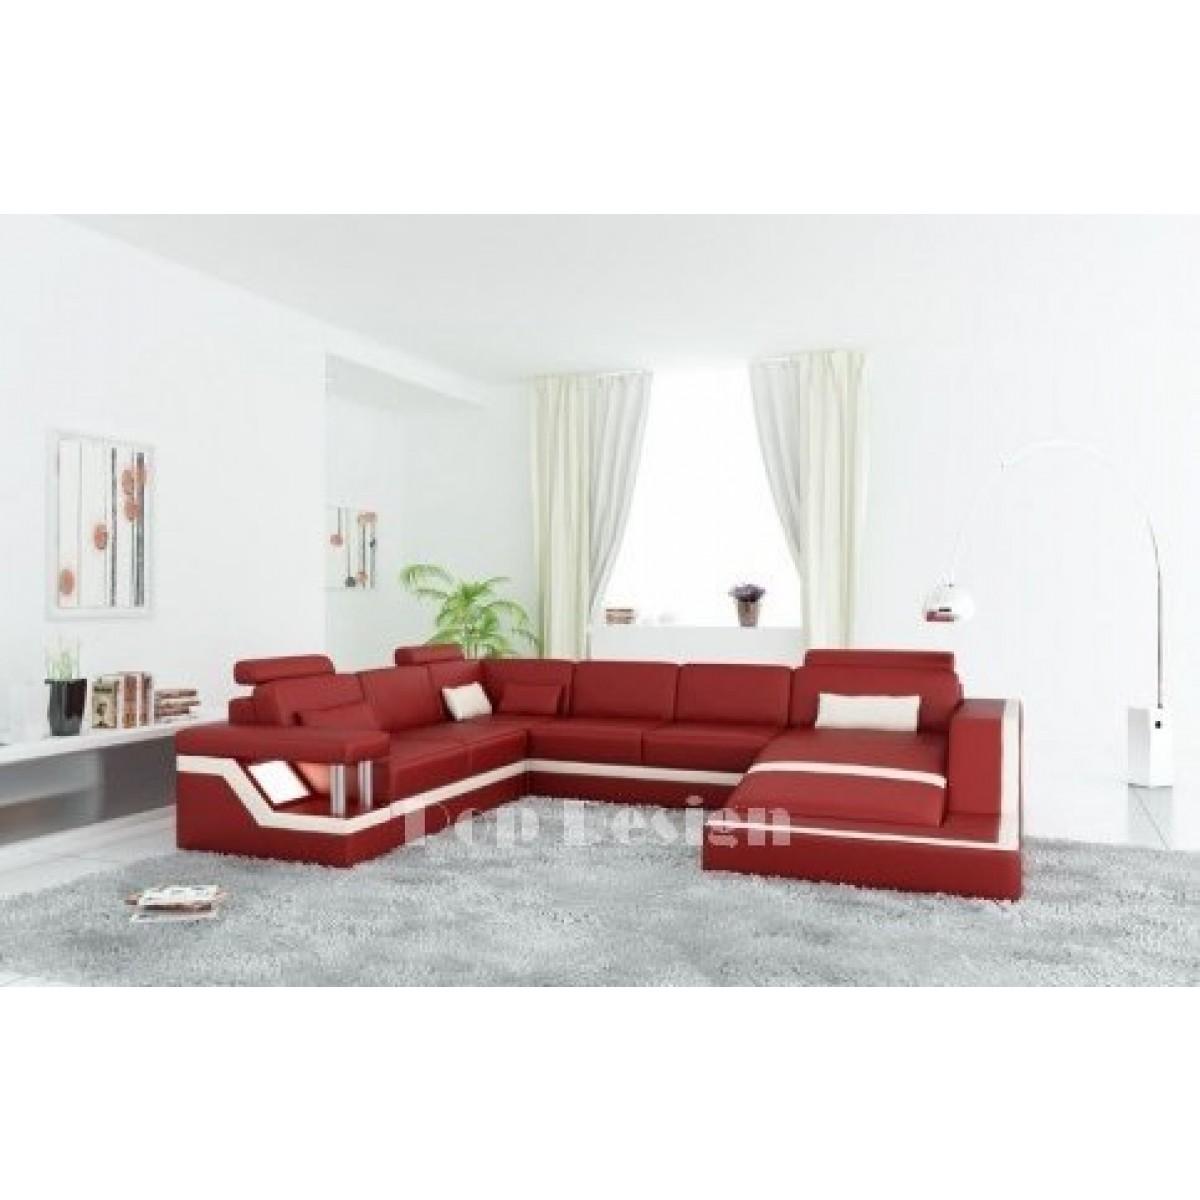 canap d 39 angle panoramique design en cuir tosca xl clairages. Black Bedroom Furniture Sets. Home Design Ideas